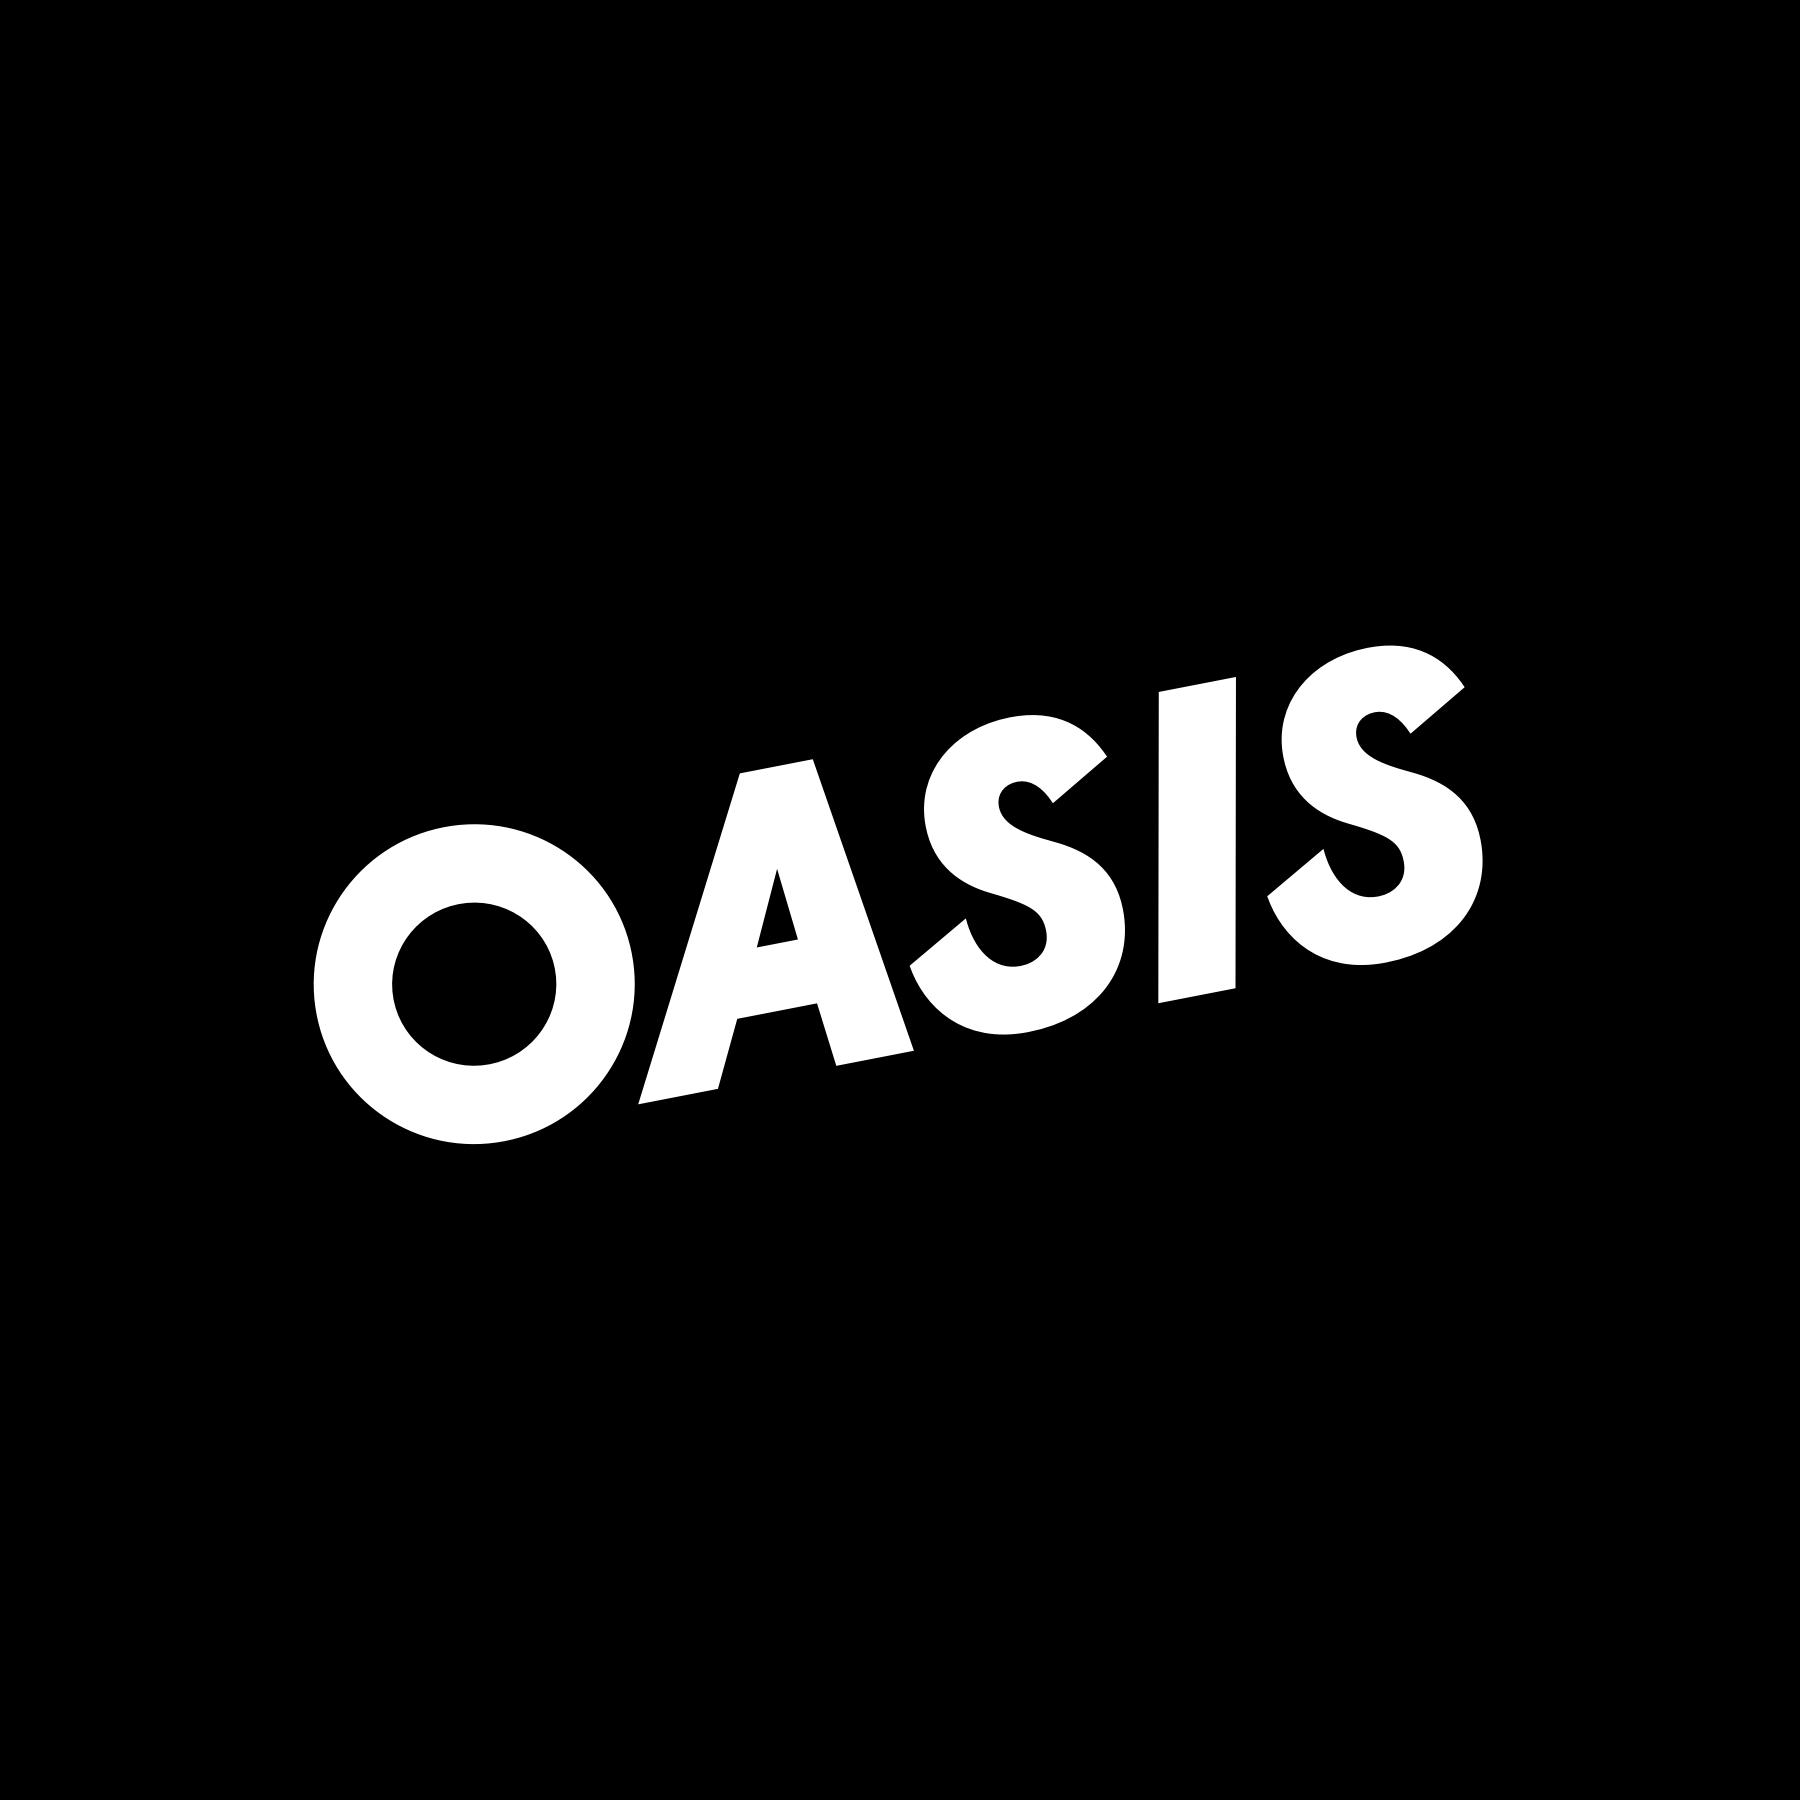 Oasis Square Black logo.png